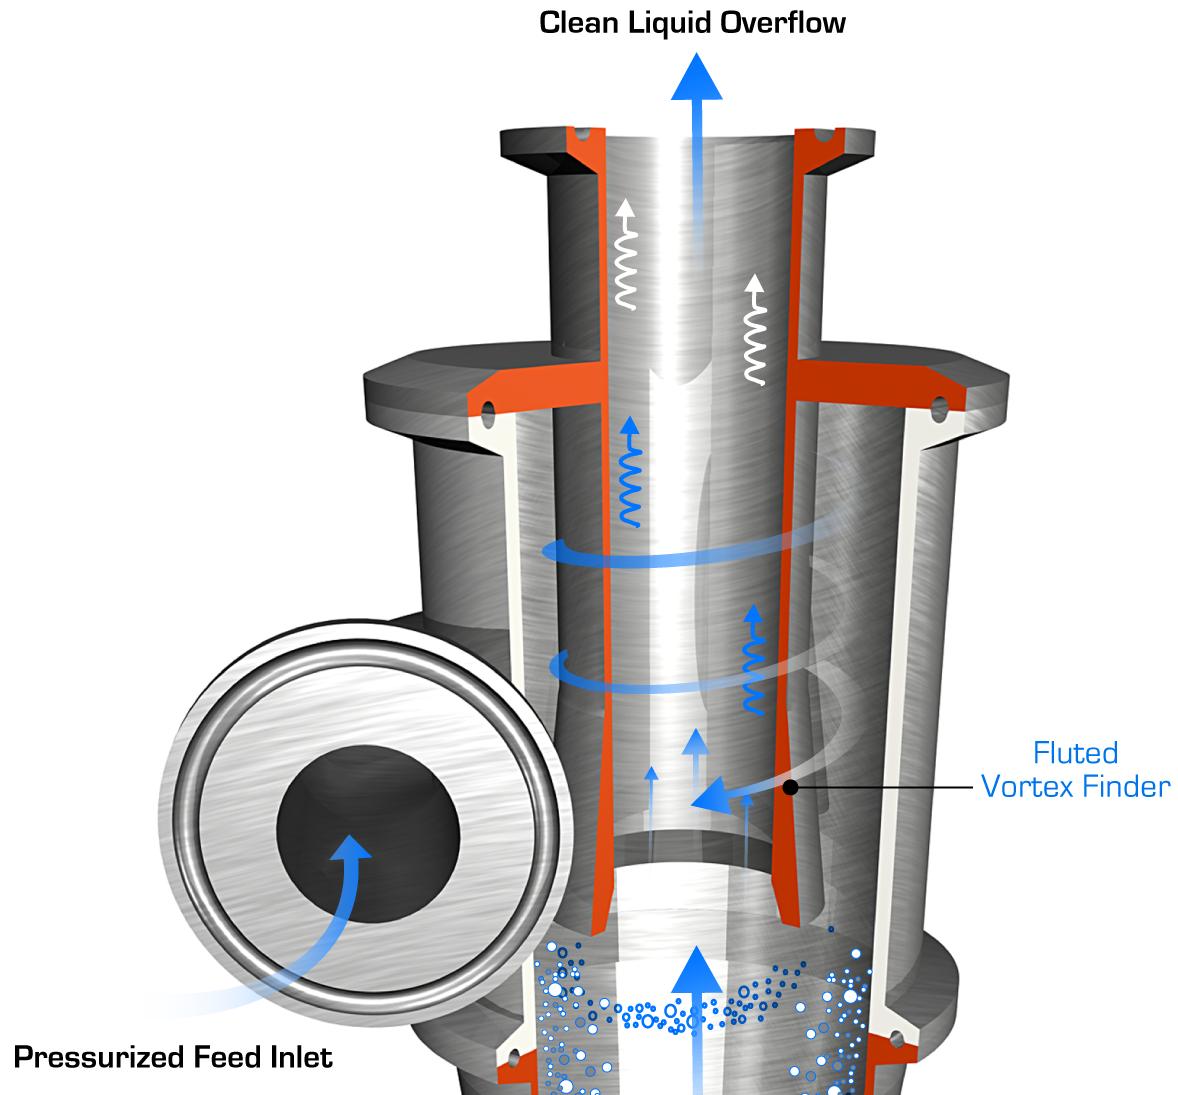 Vorspin Hydrocyclone Cutaway